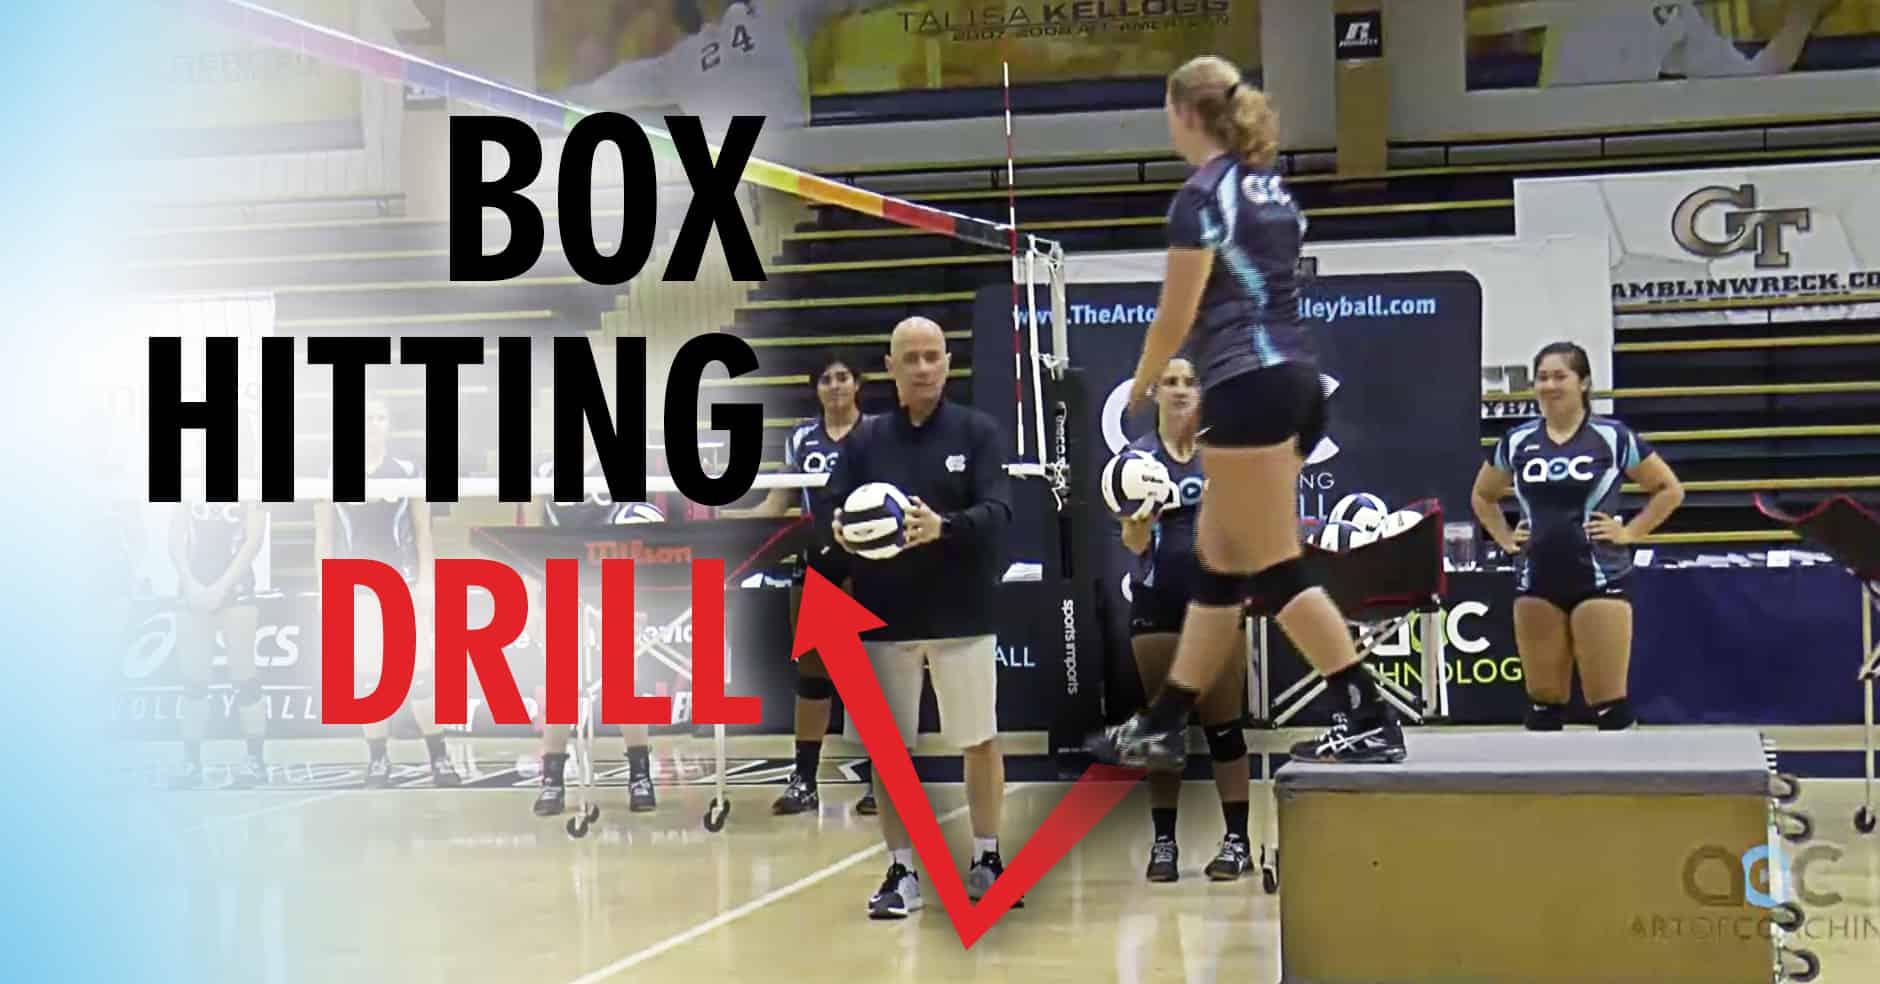 Box Hitting Drill